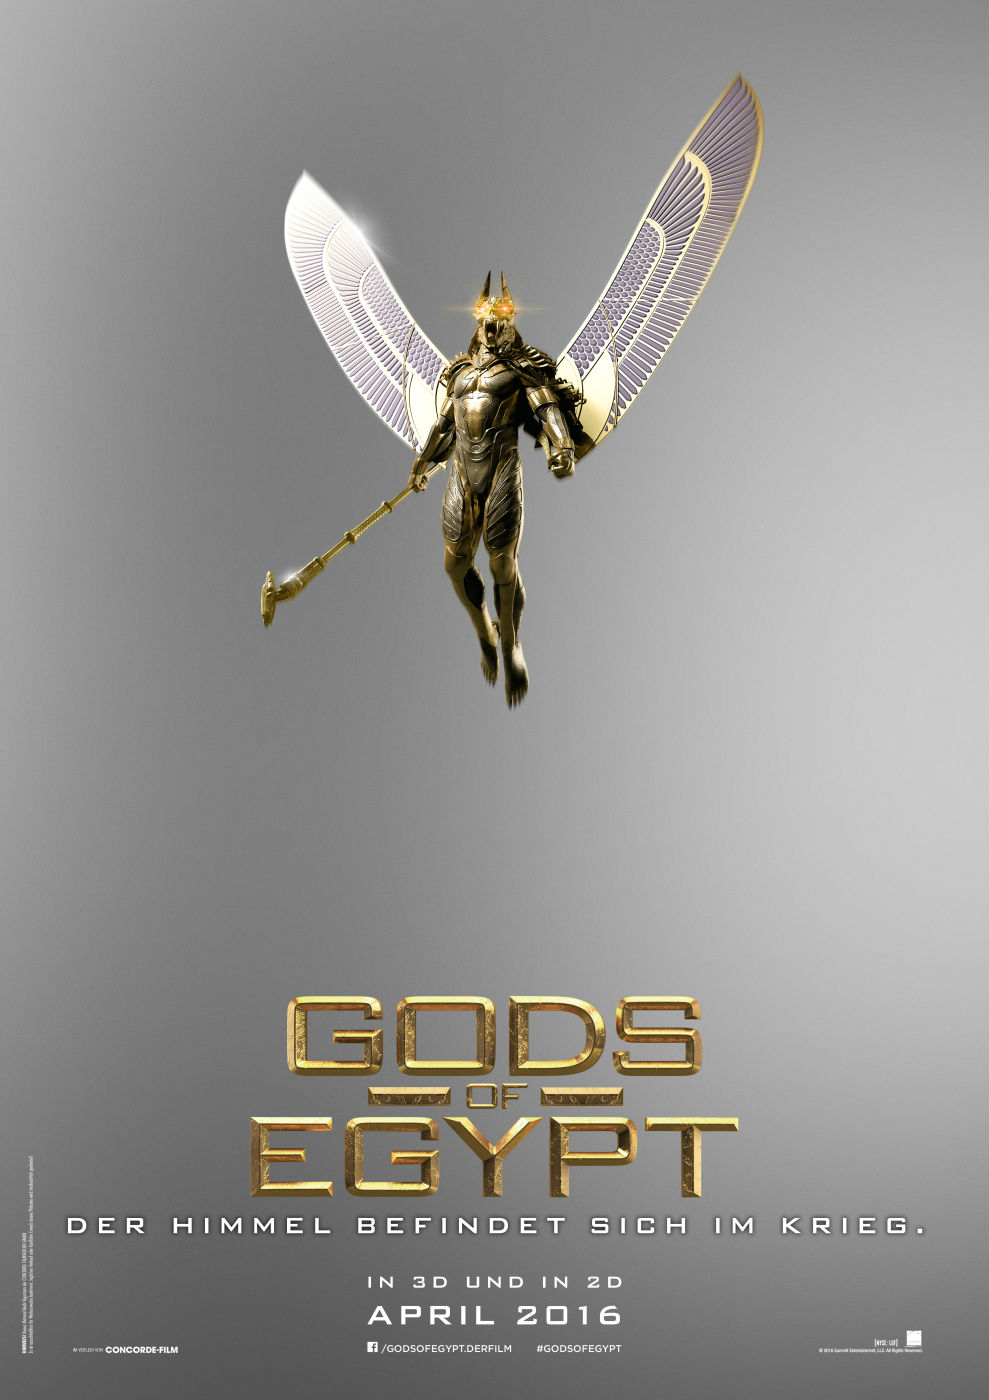 god of egypt deutsch